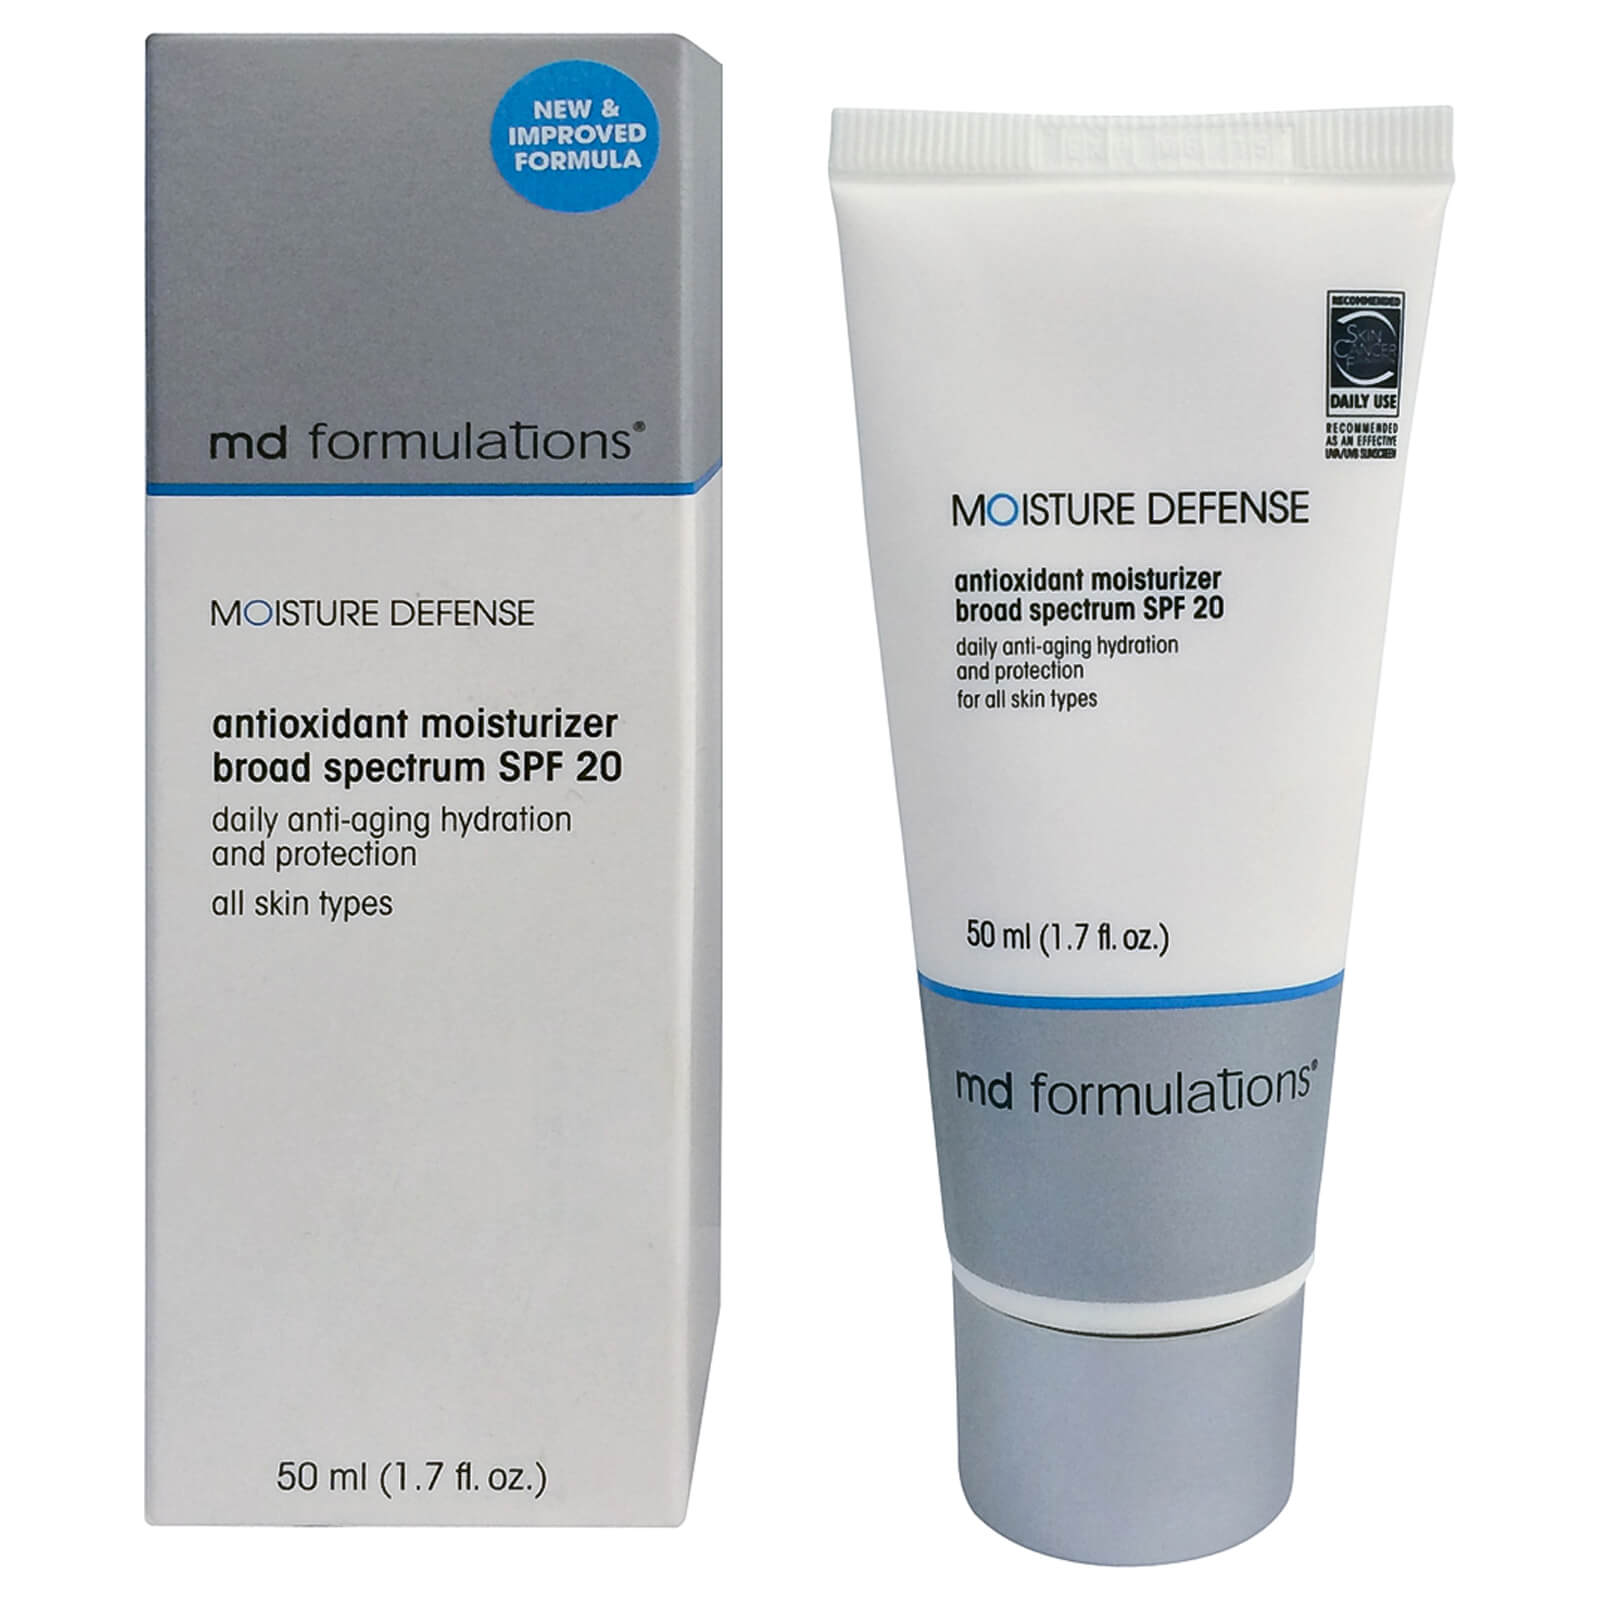 MD Formulations Moisture Defense Antioxidant Moisturizer SPF 20